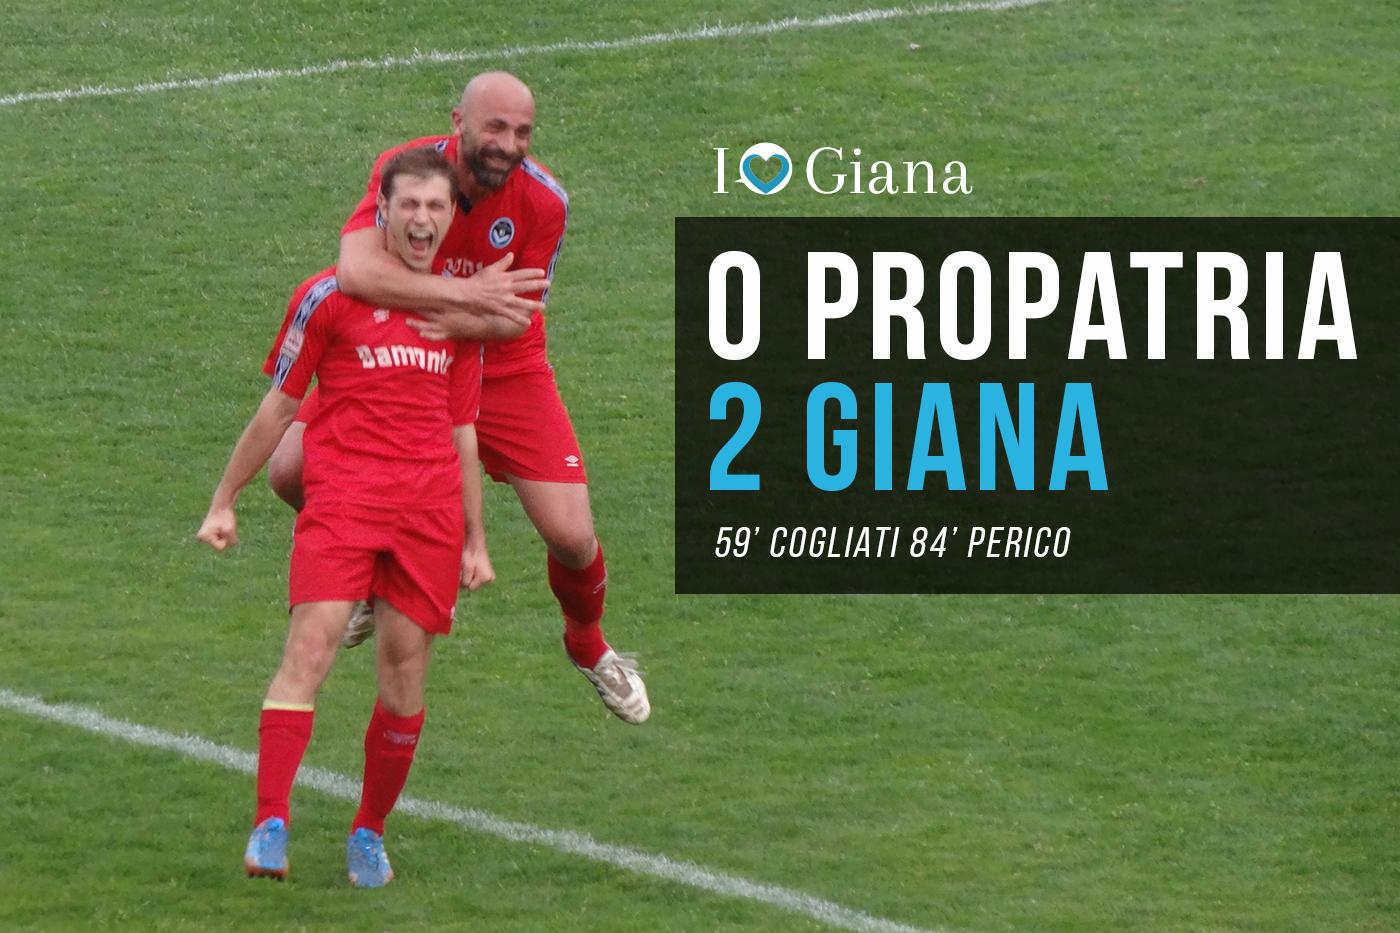 Propatria Giana 0-2 Lega pro Girone A - www.ilovegiana.it